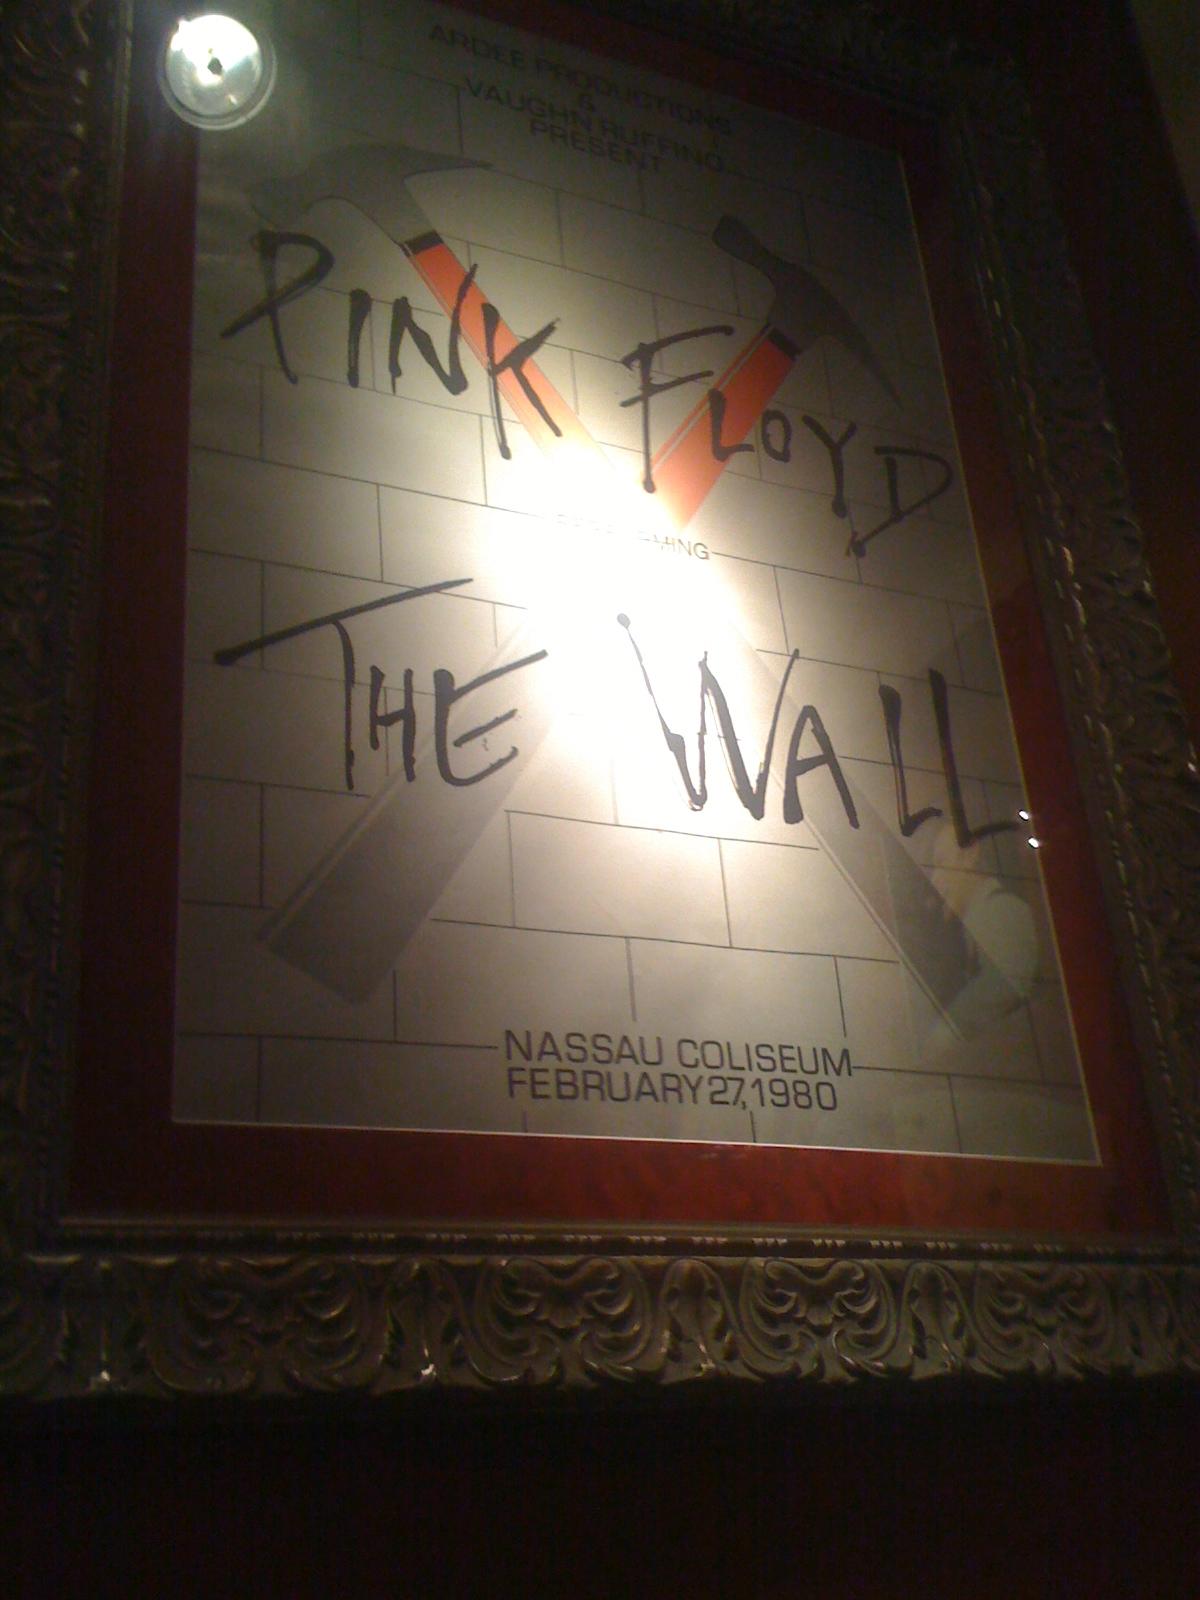 Pink Floyd - The Wall.JPG